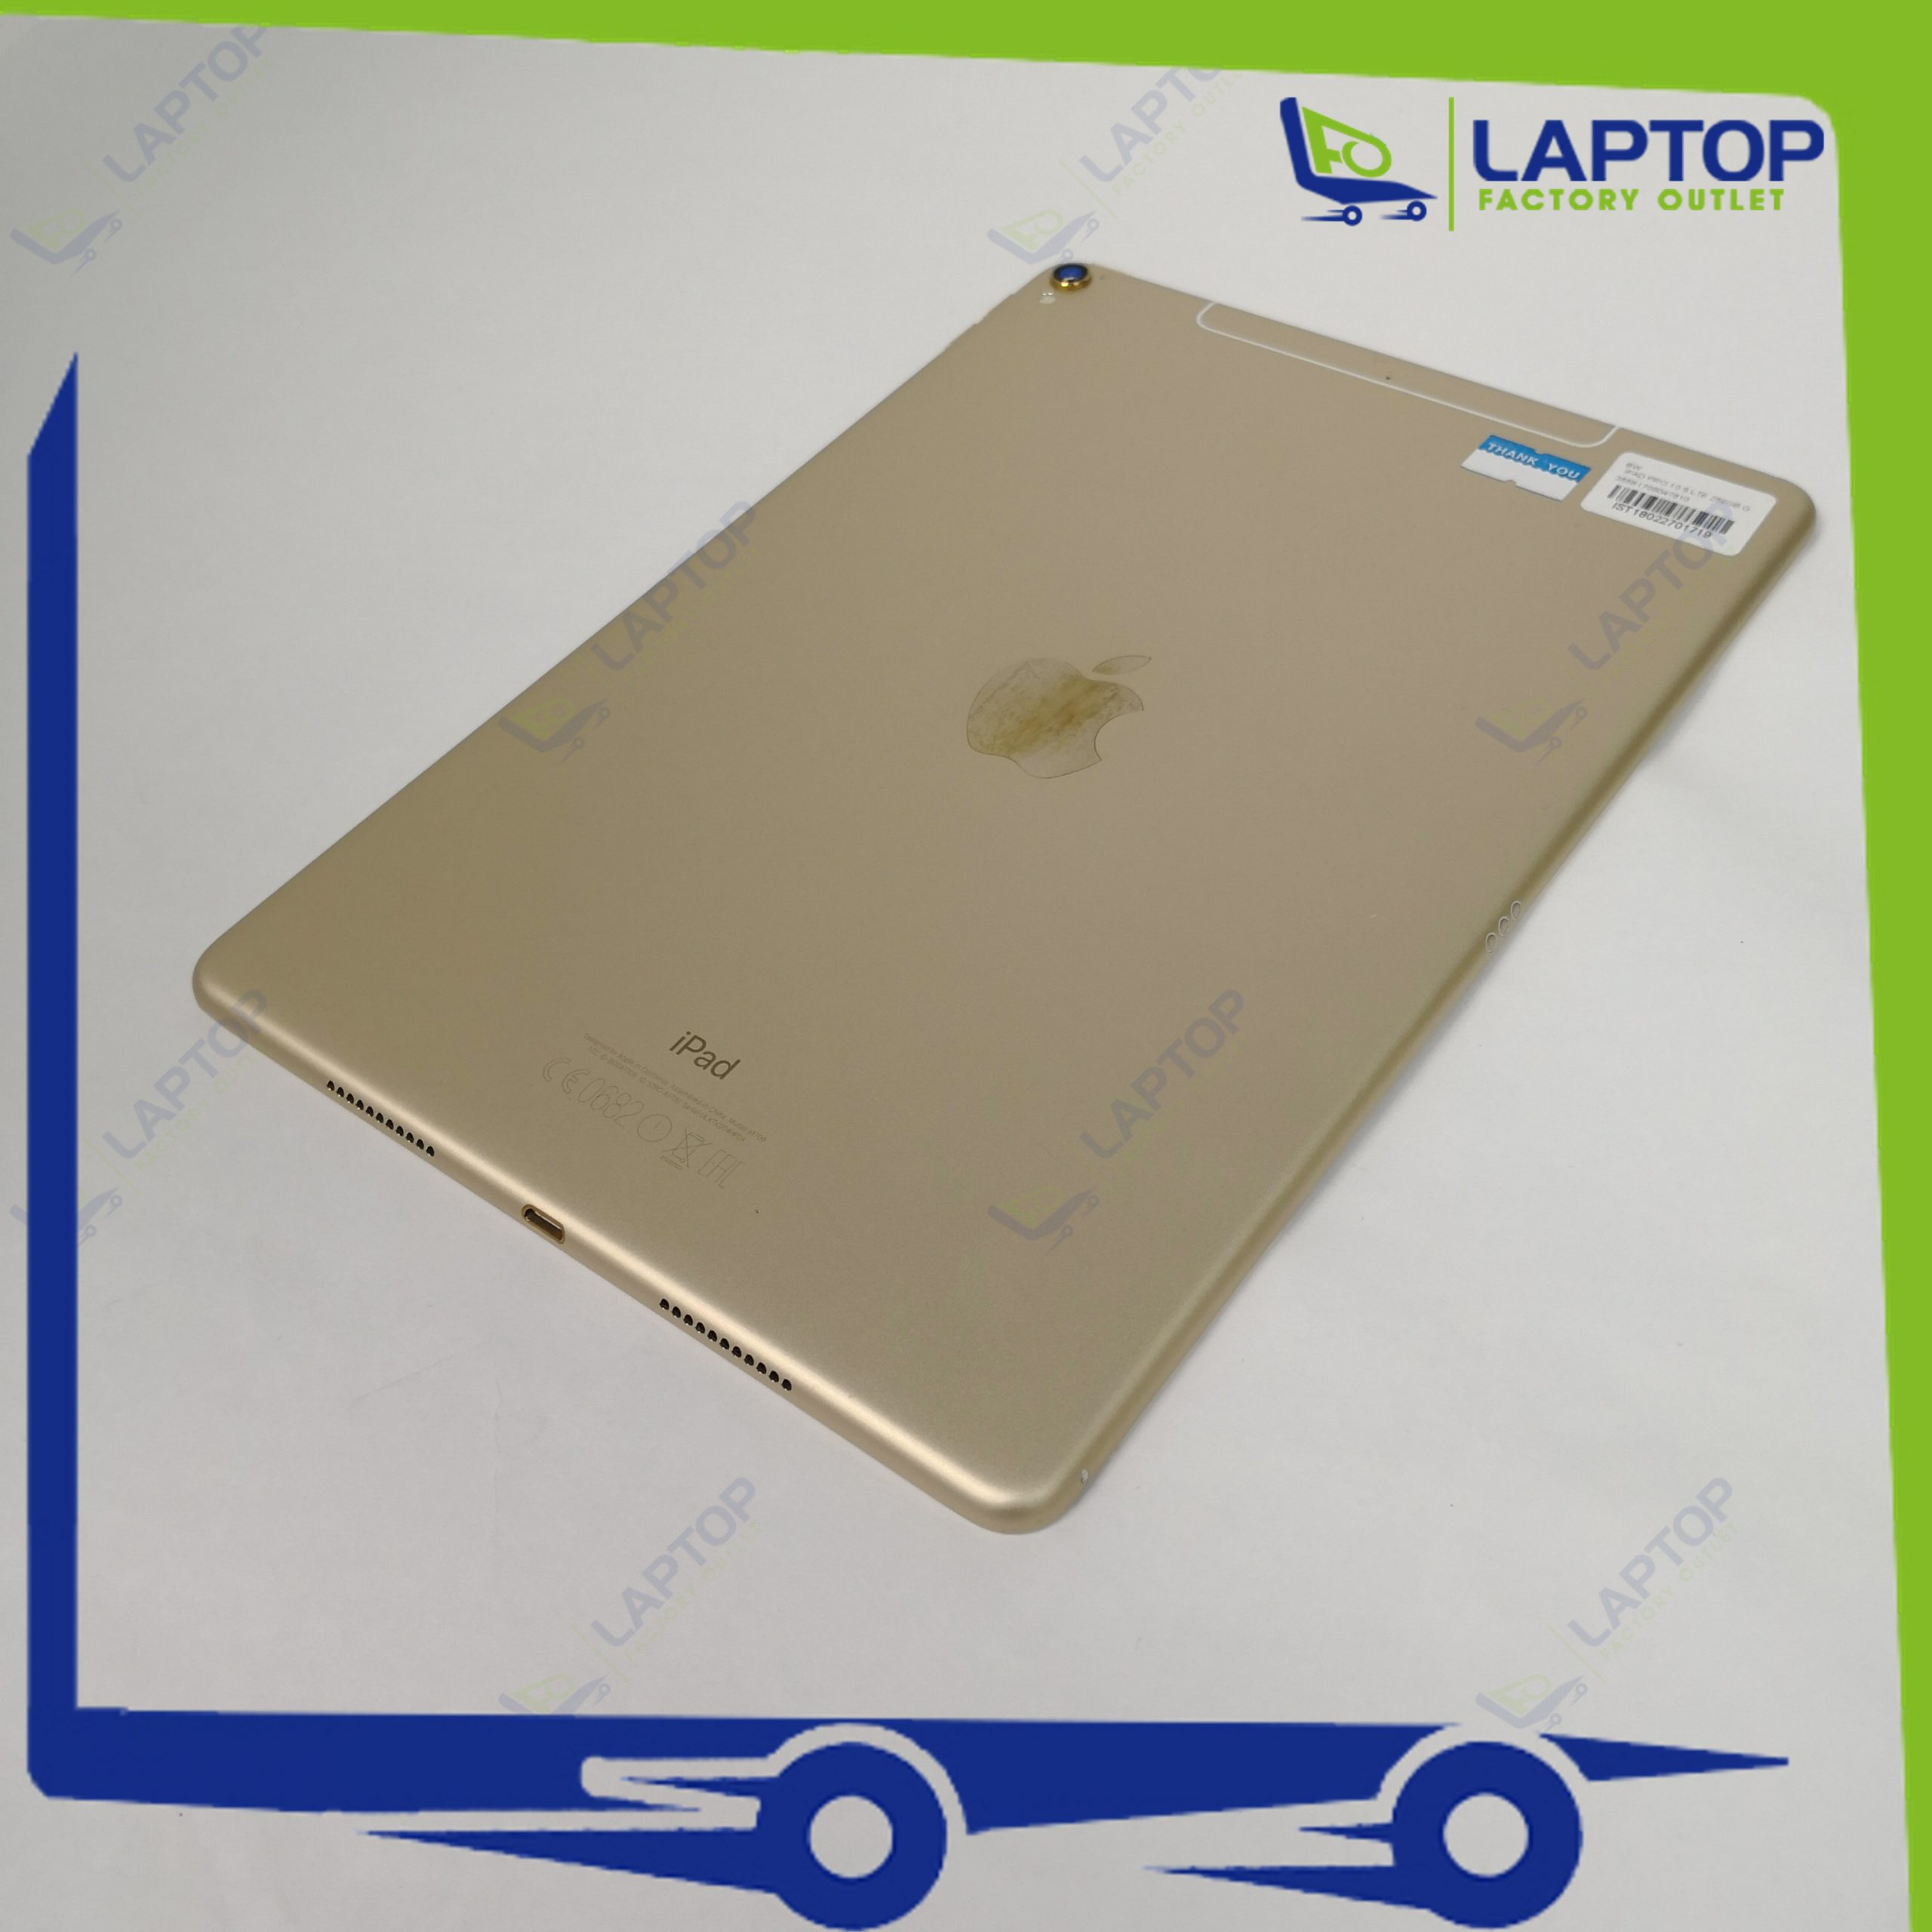 APPLE iPad Pro 10.5 (WiFi+Cellular) 256GB Gold [Preowned]